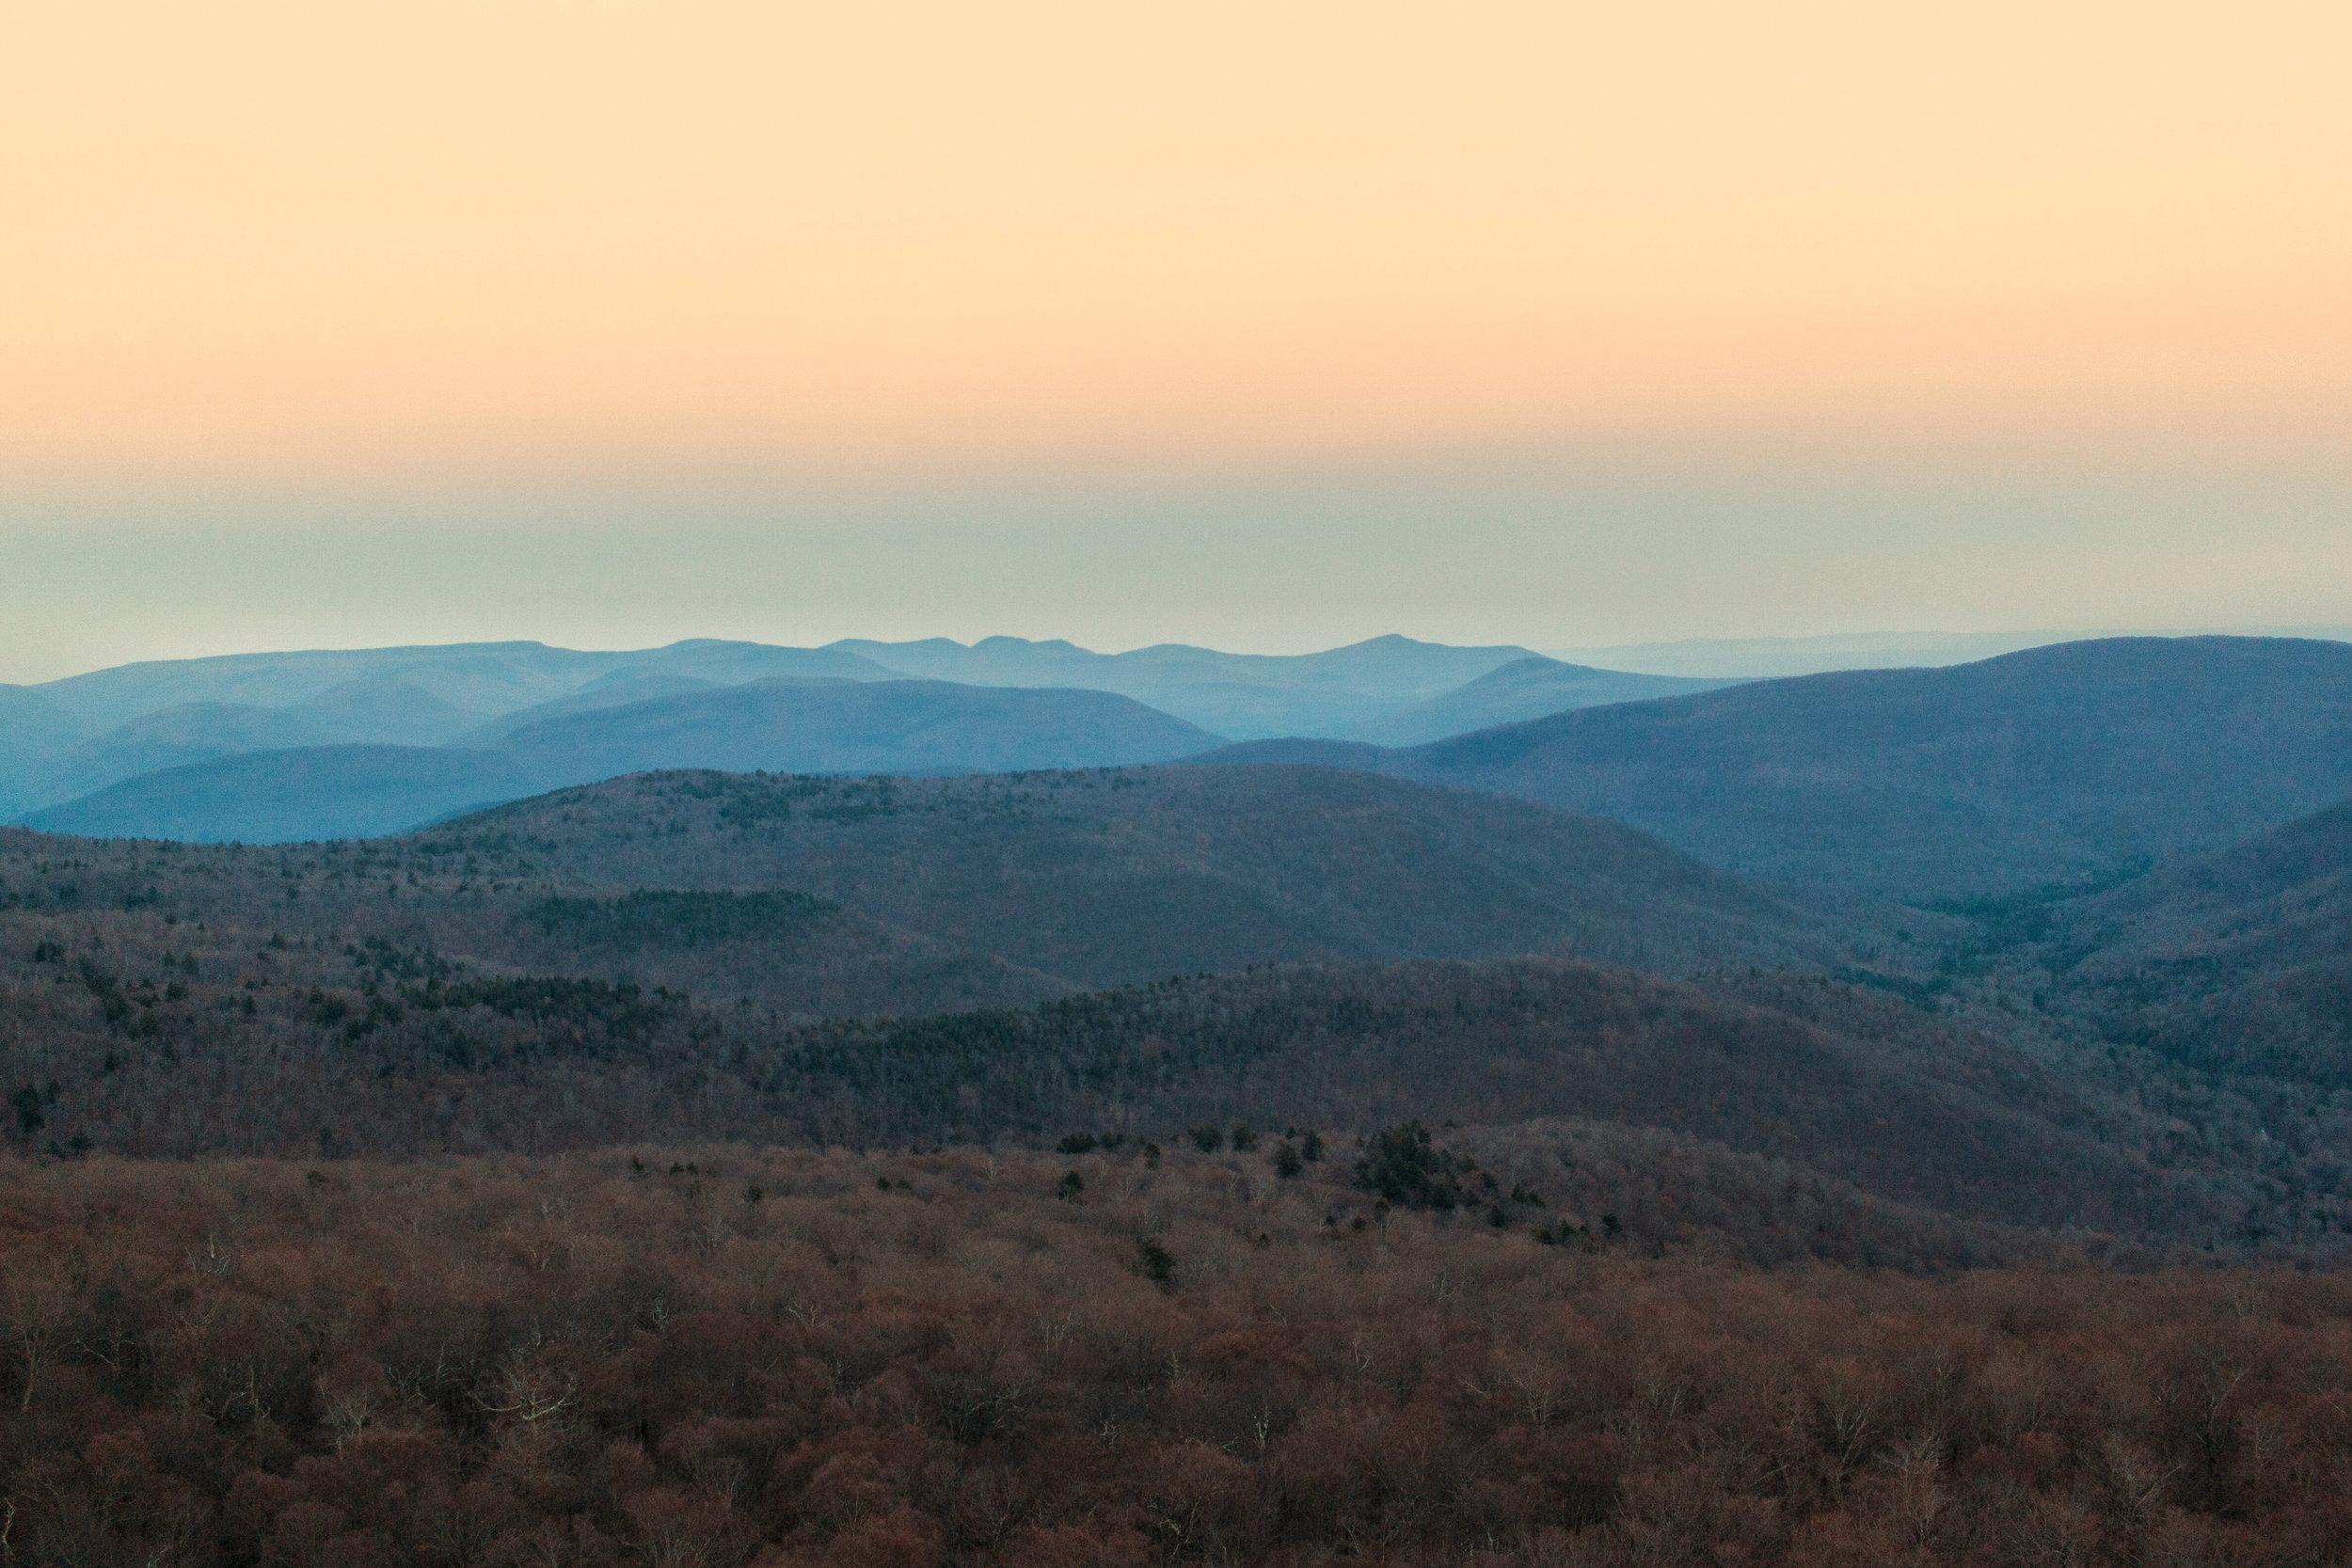 sunset hike giants ledge